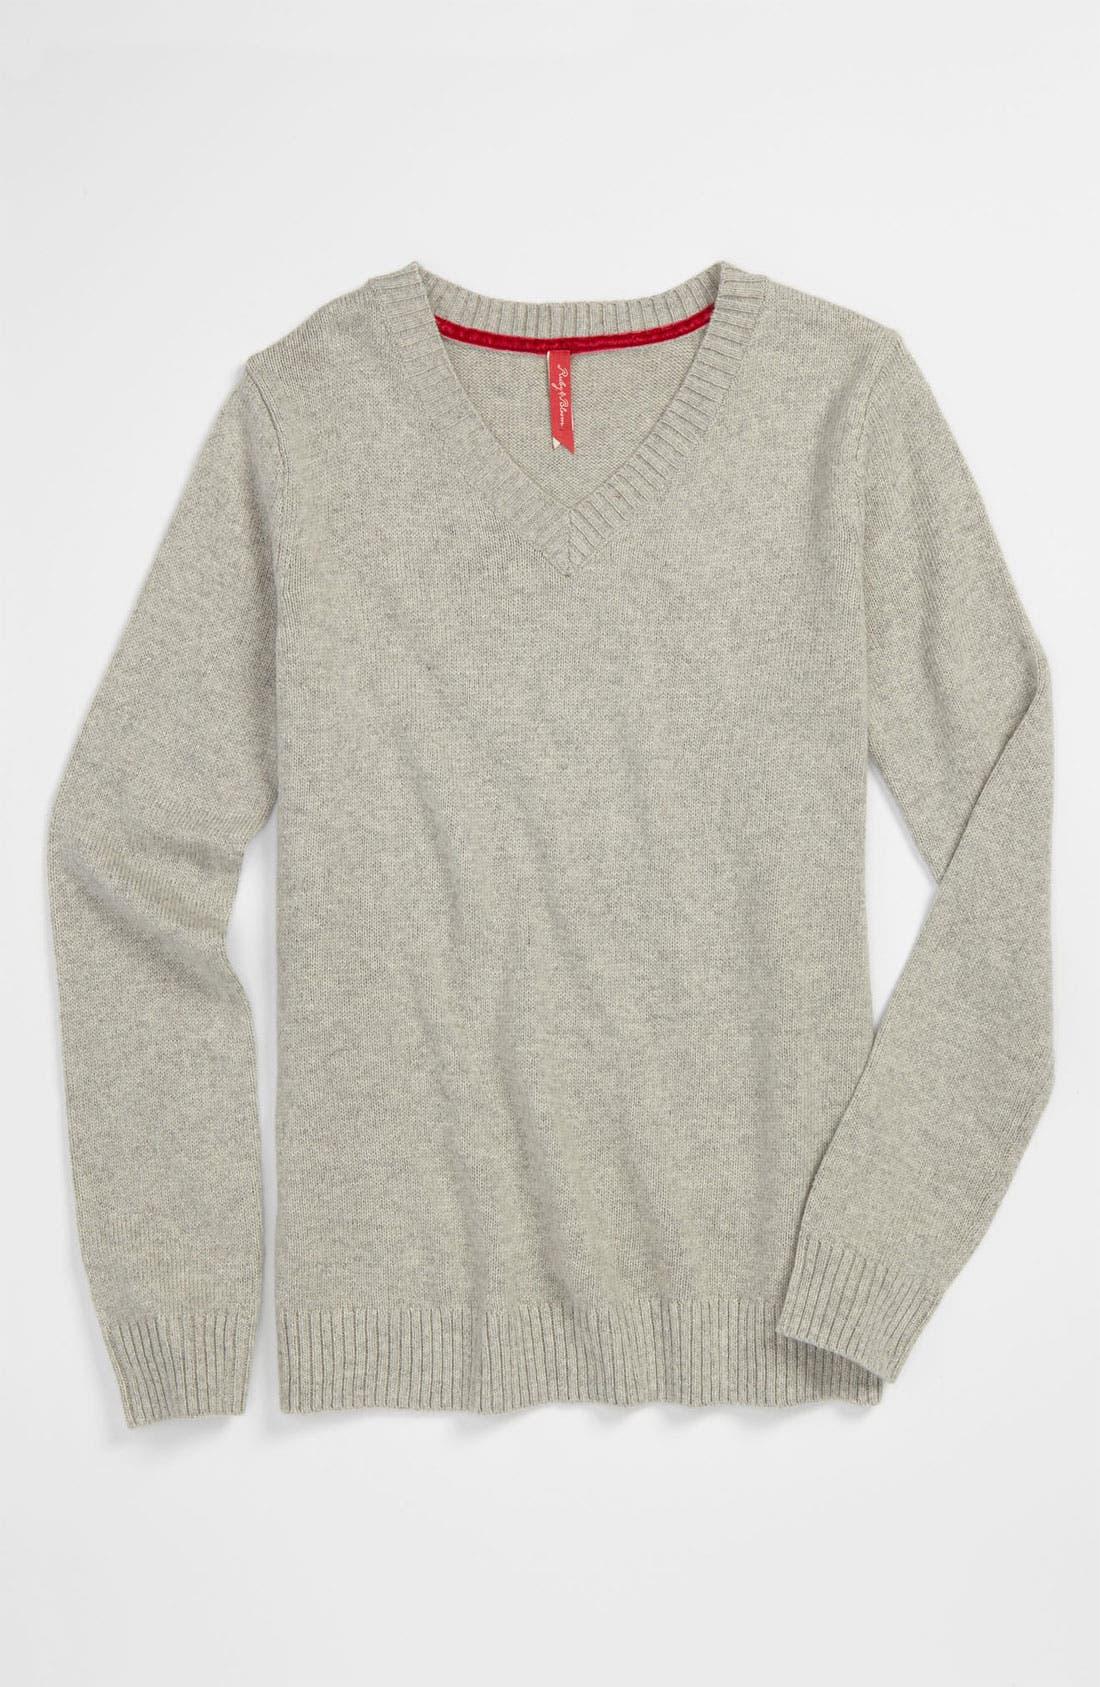 Main Image - Ruby & Bloom 'Robin' Sweater (Big Girls)